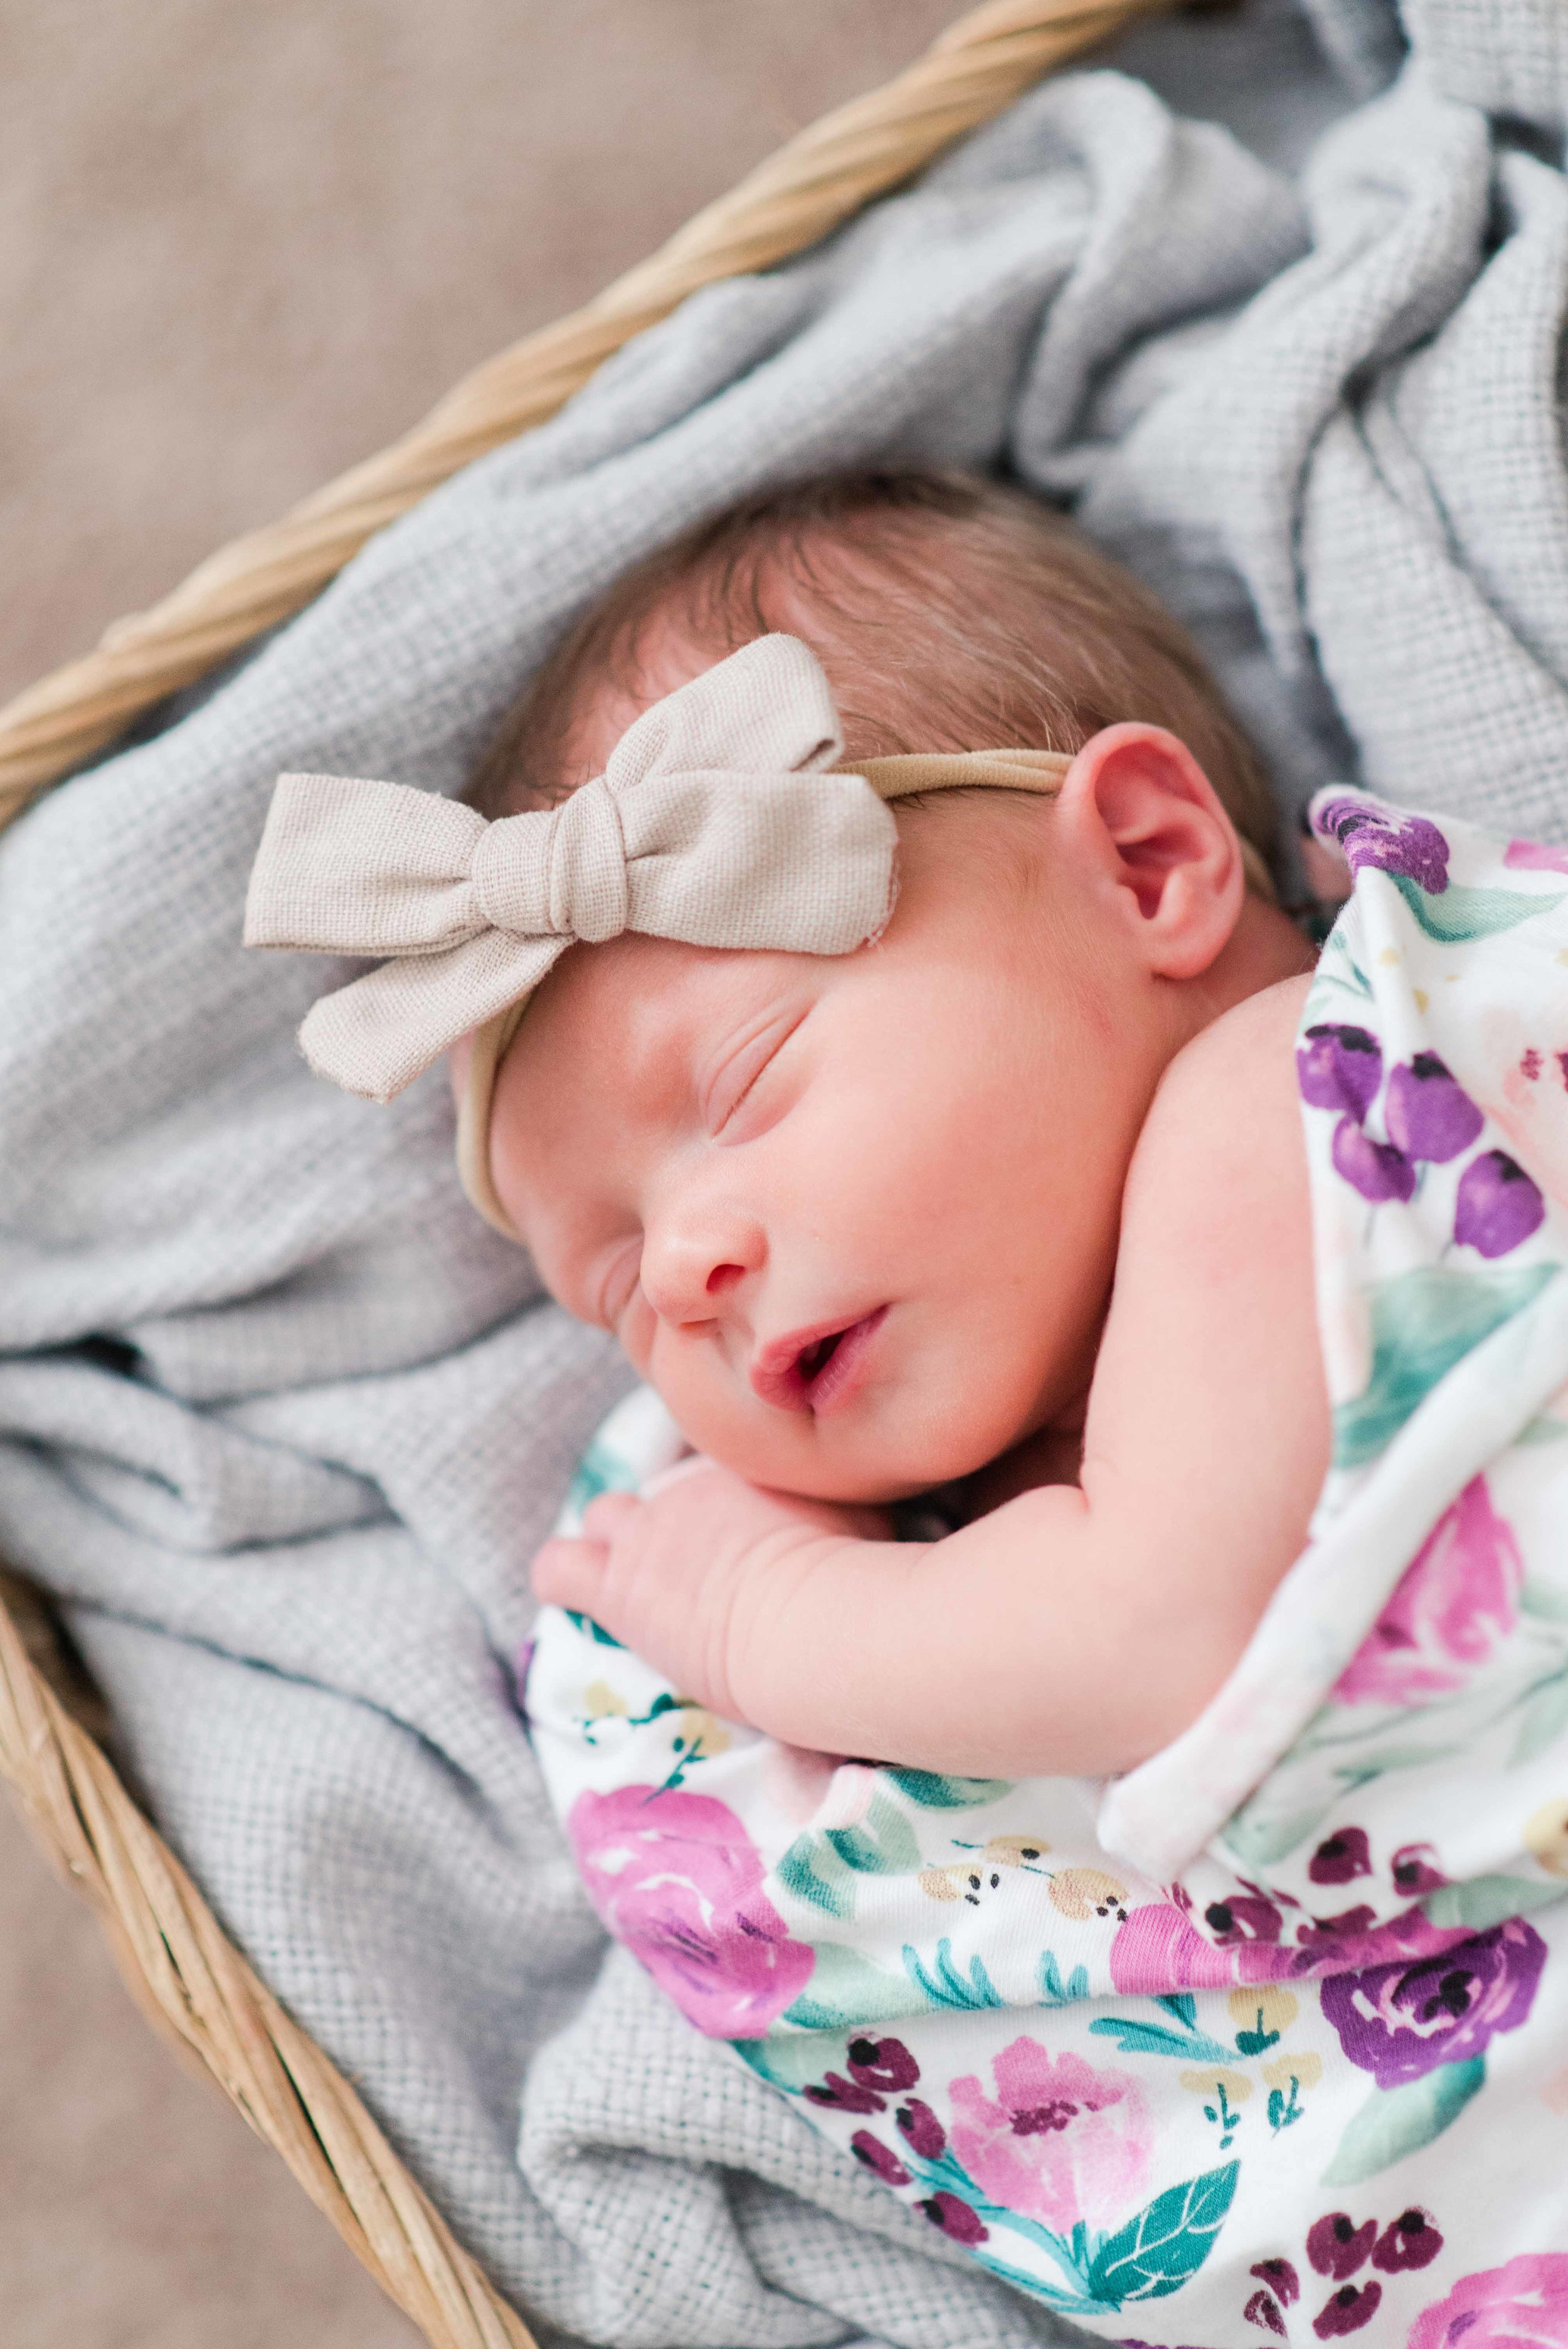 Lifestyle Newborn Portrait Session Alabama Photographer Deborah Michelle Photography